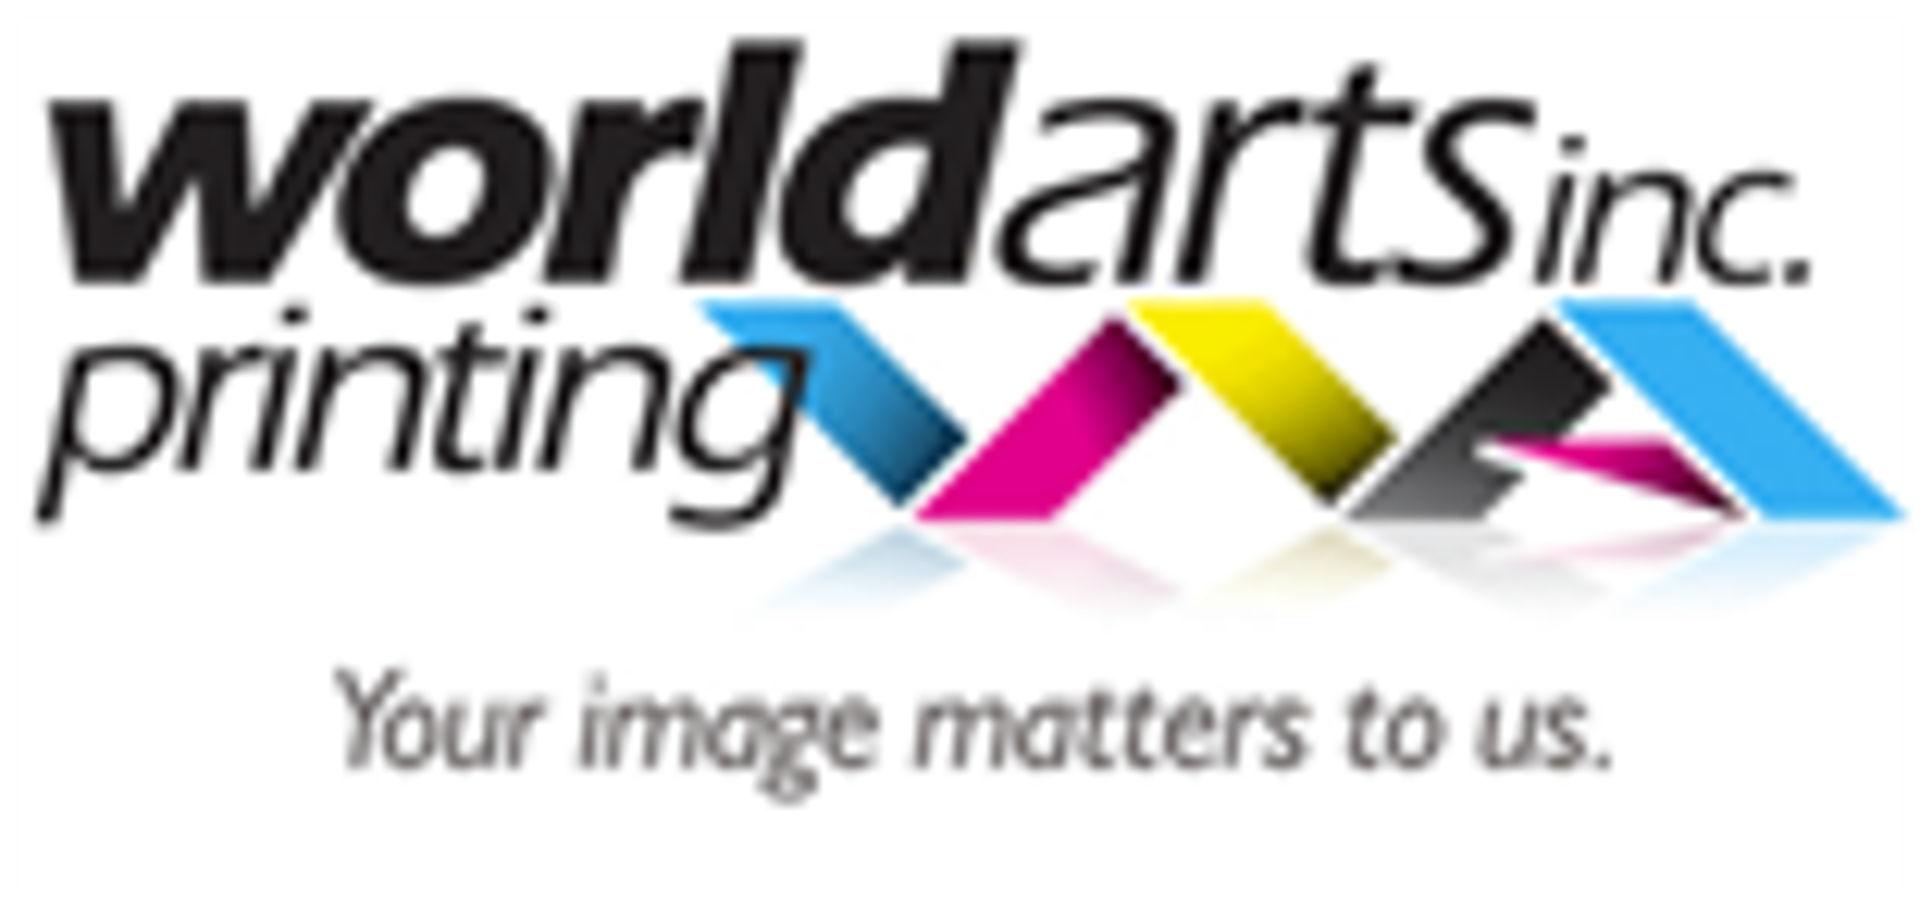 WorldArts Printing